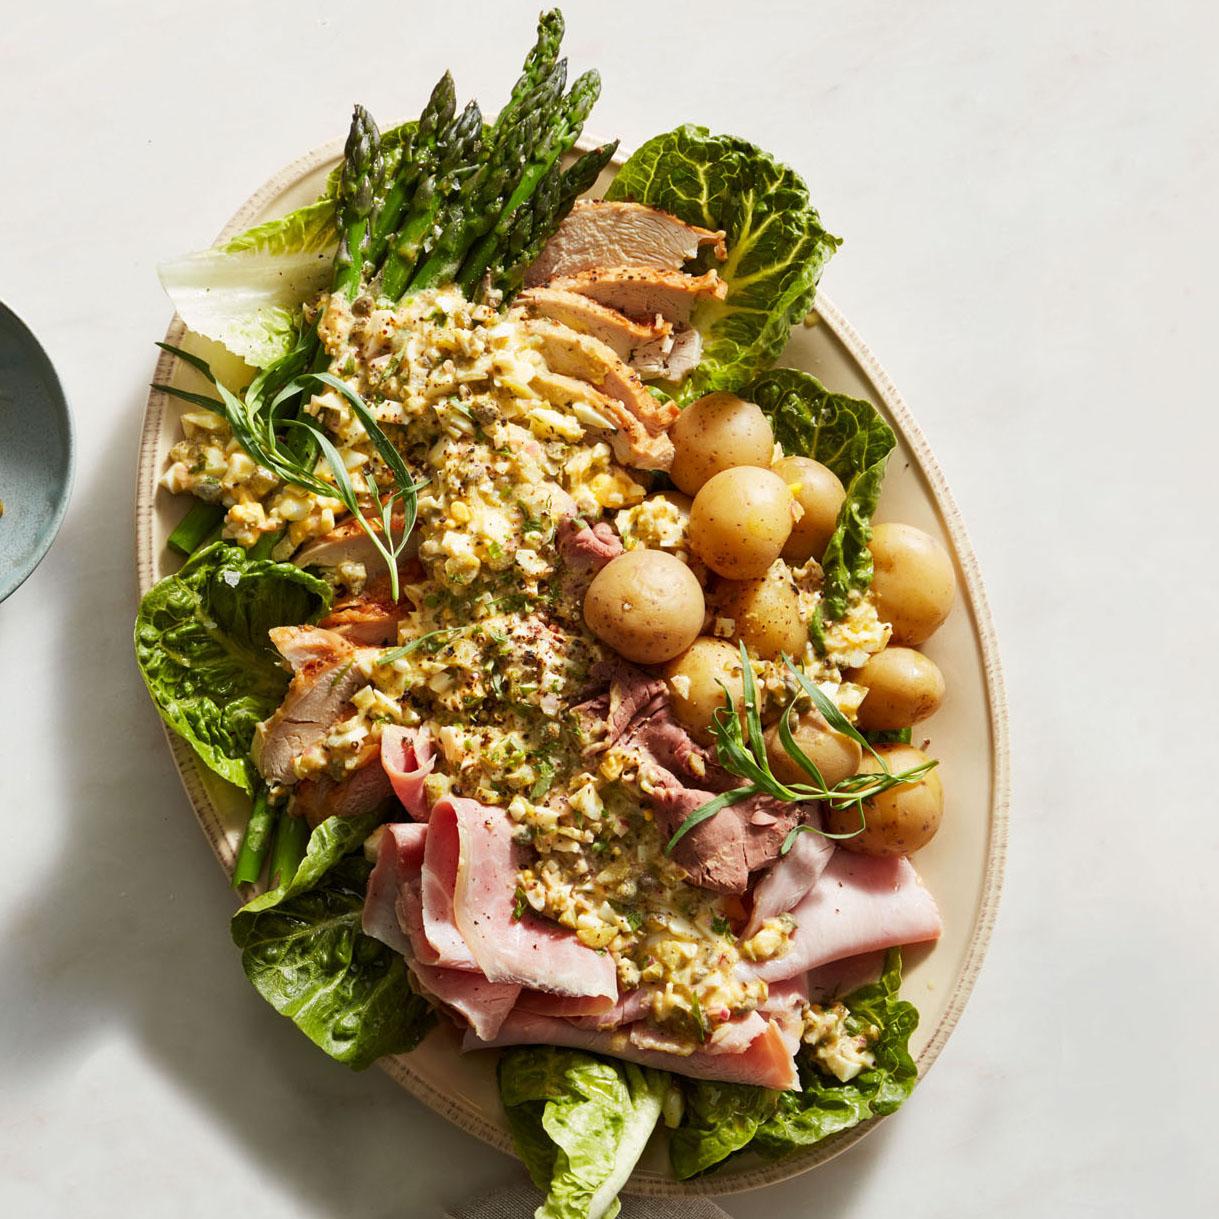 chef salad with gribiche dressin